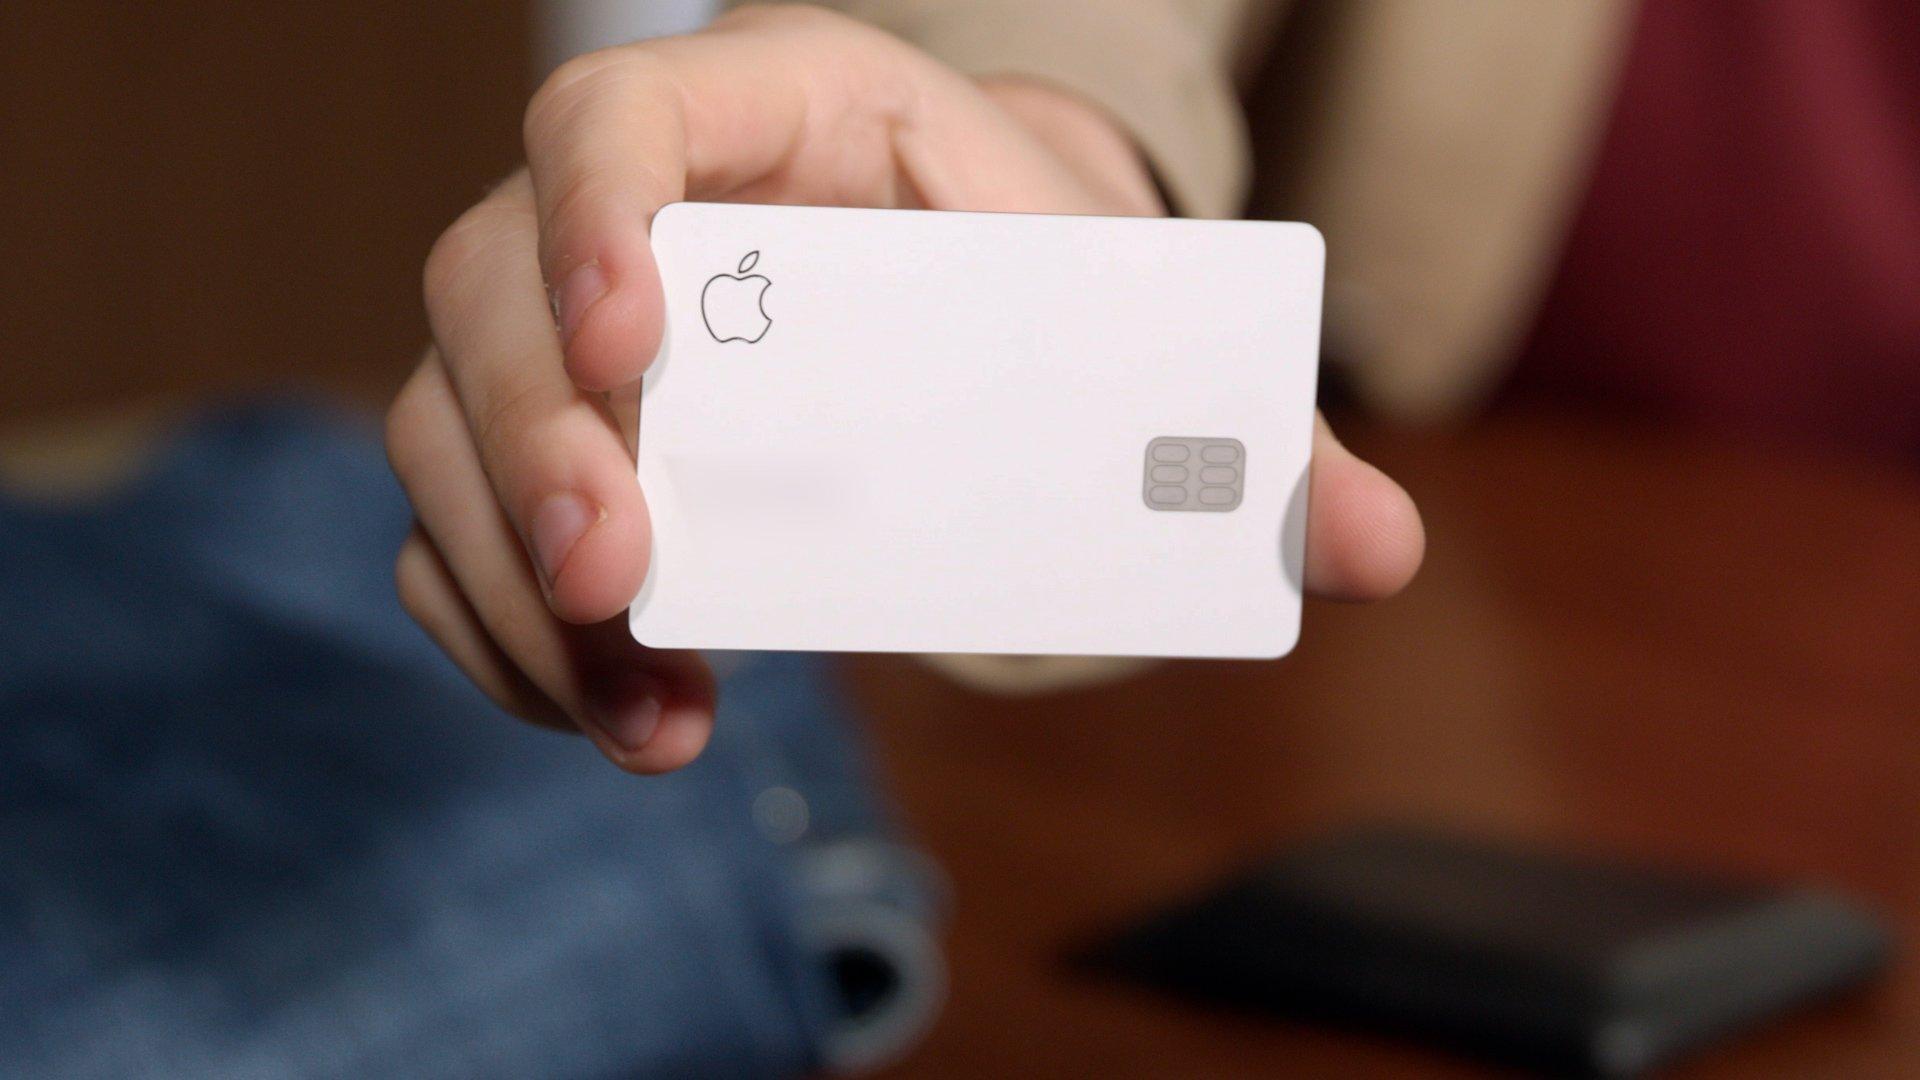 Apple co-founder Steve Wozniak says Apple Card discriminated against his wife